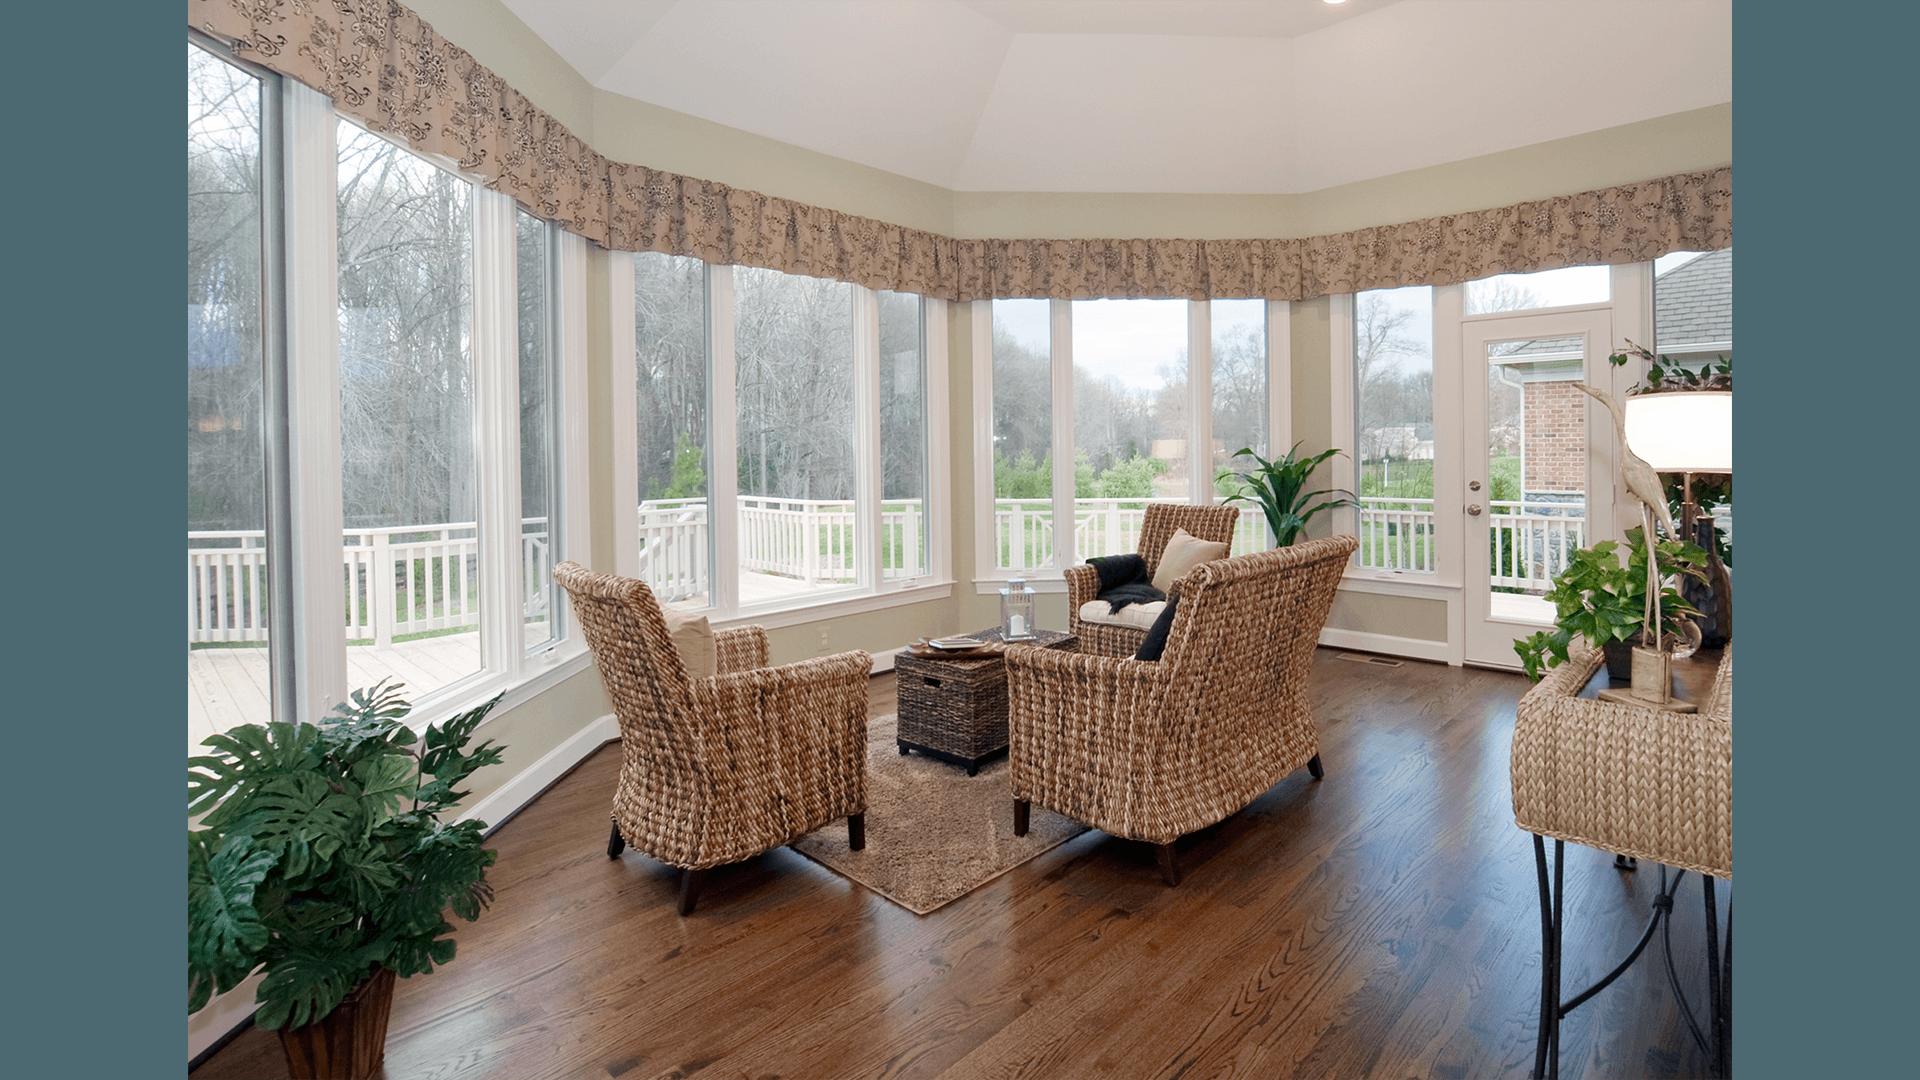 Grovemont Winthrop - Sunroom